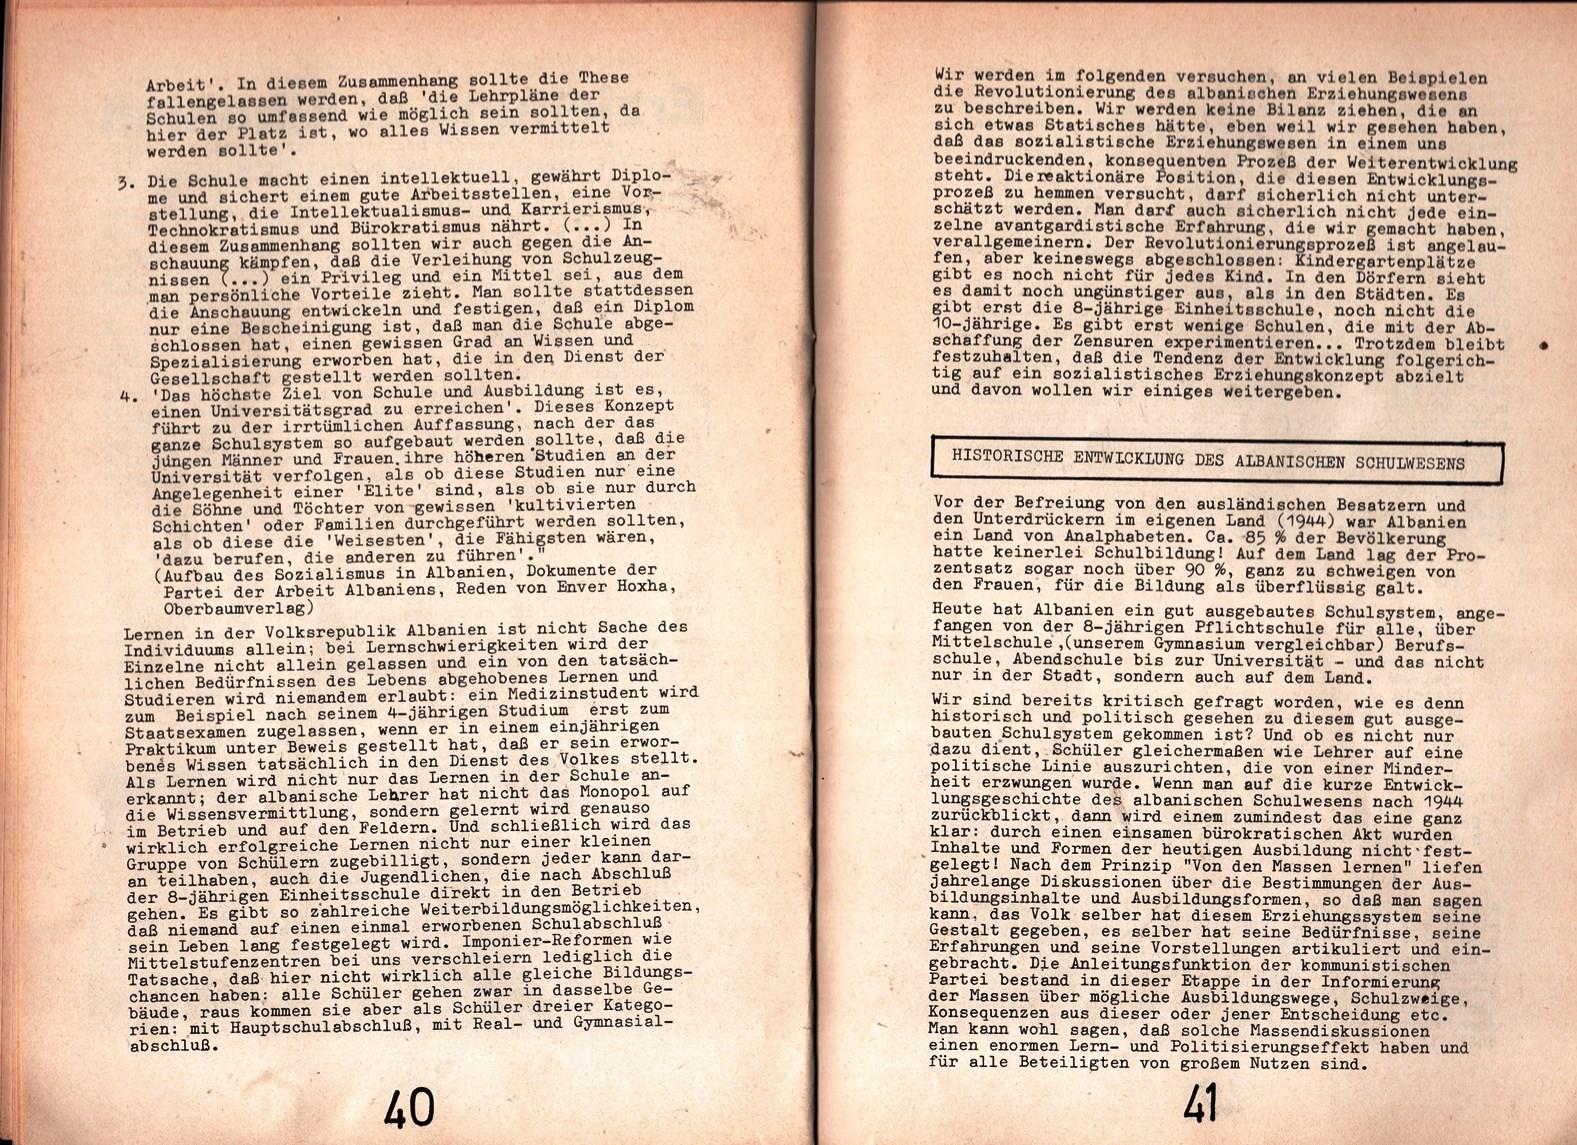 Berlin_1974_Reisebericht_Albanien_023